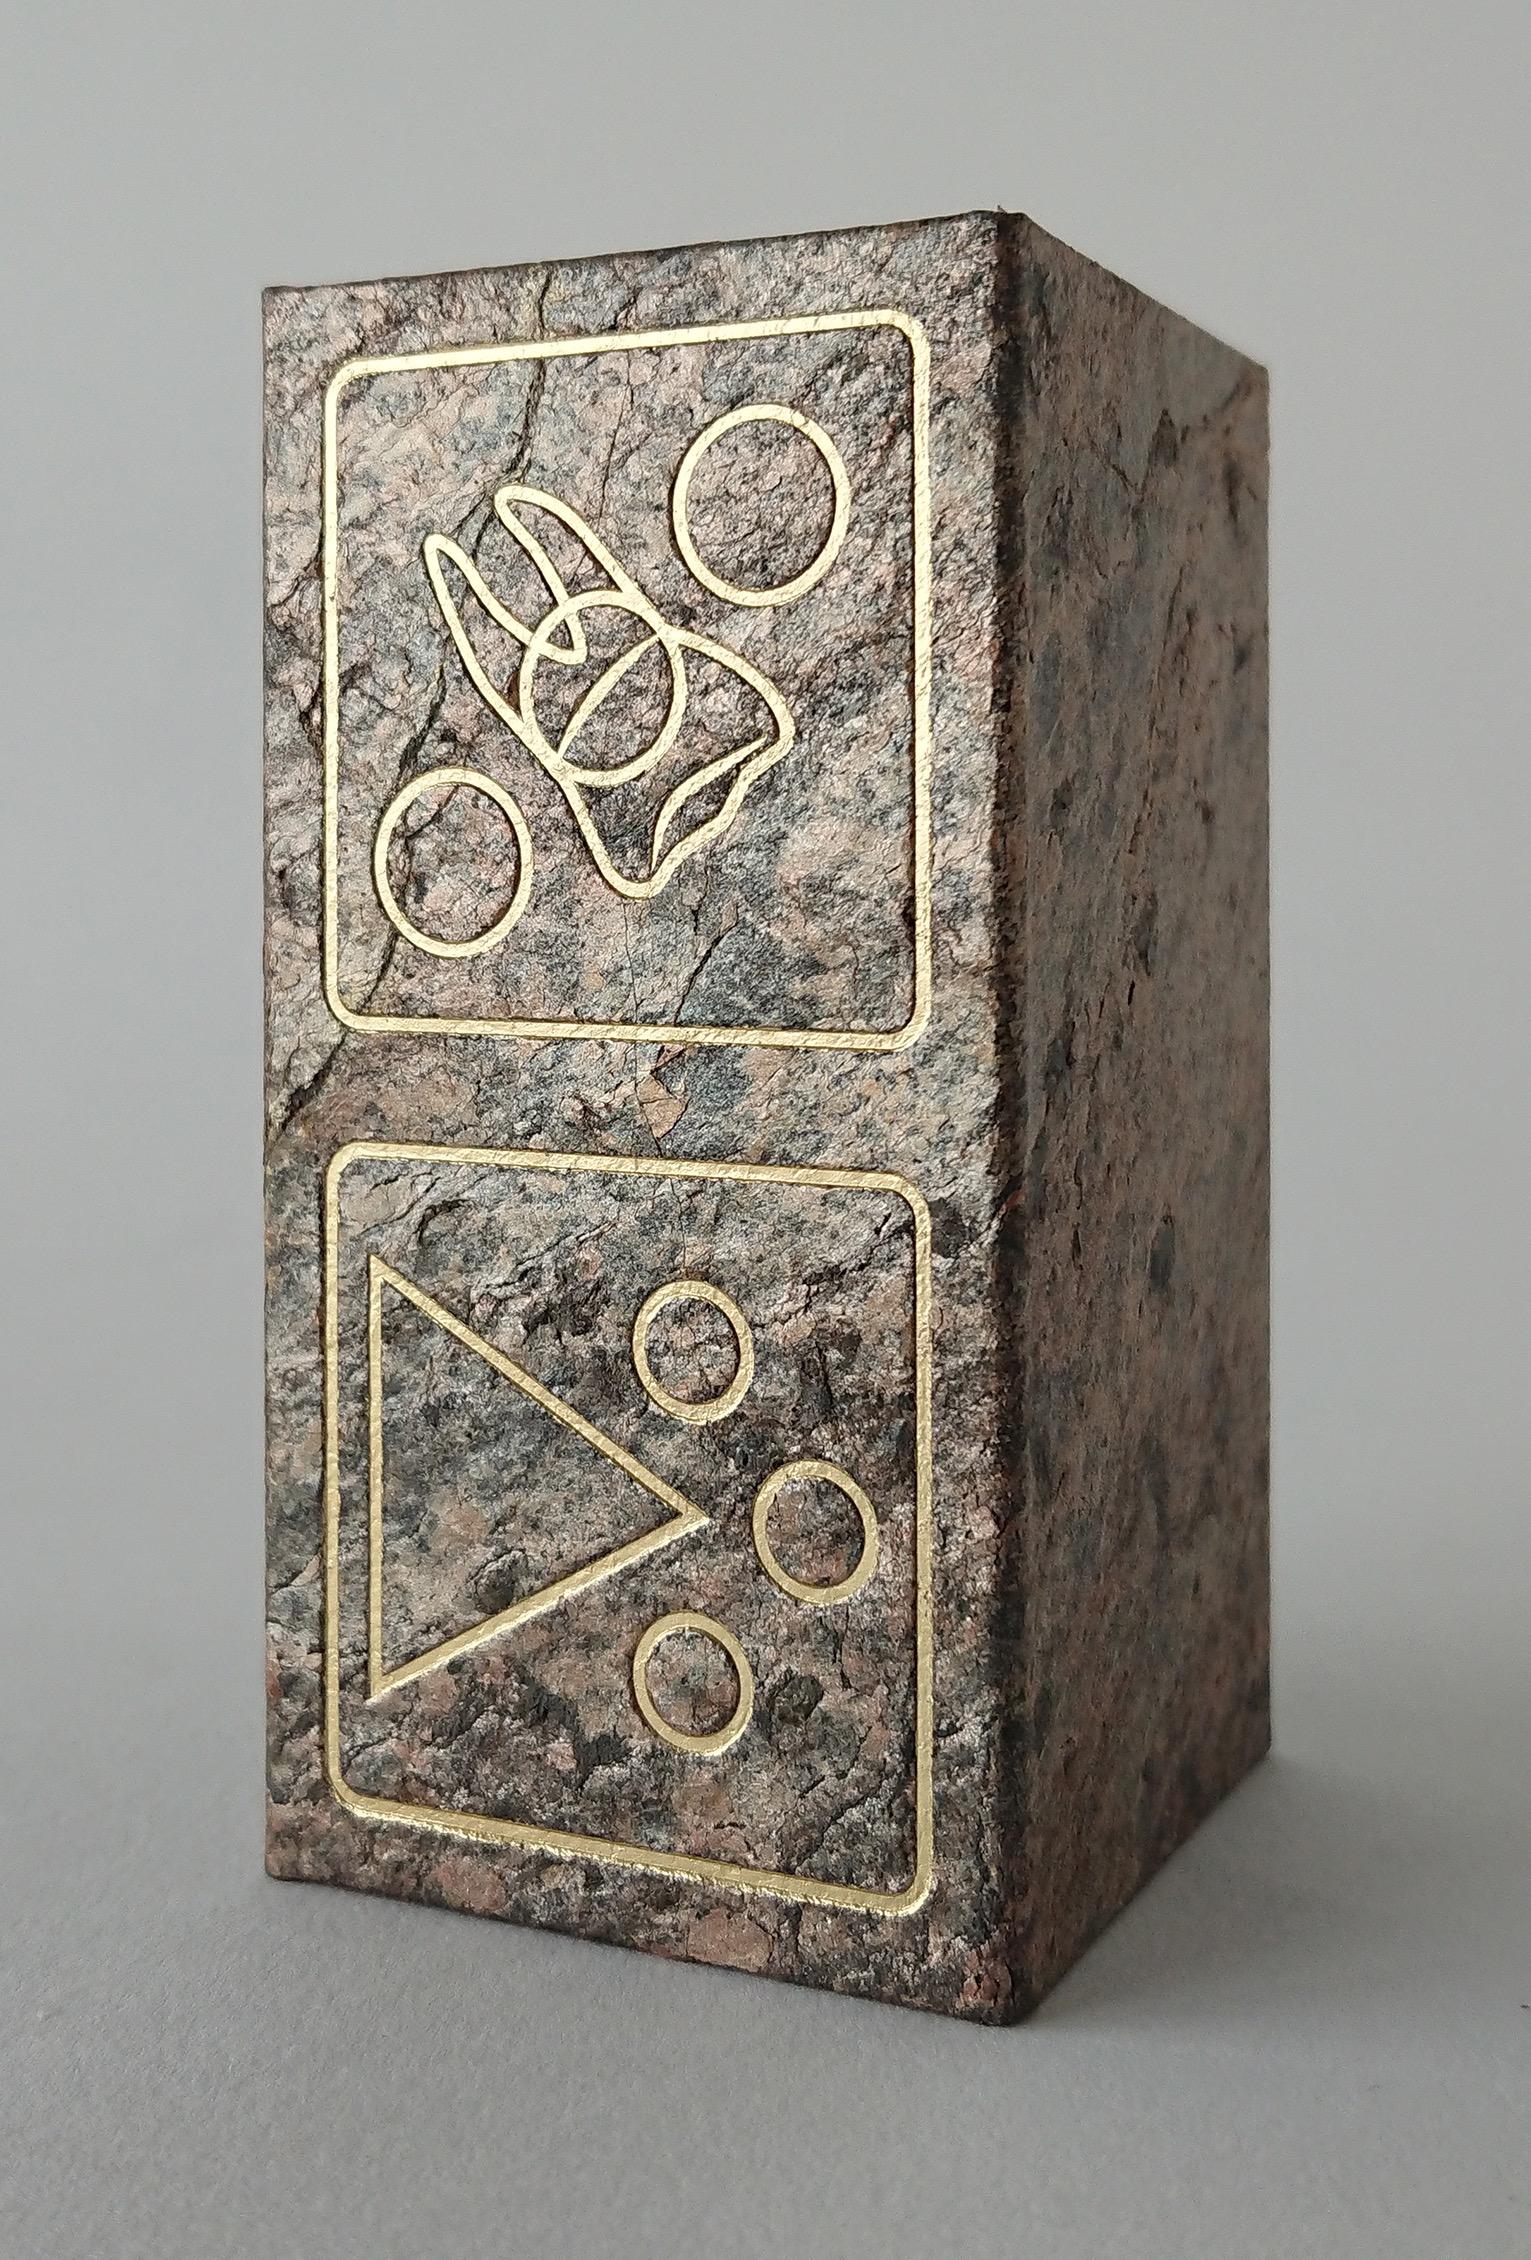 box in stone veneer